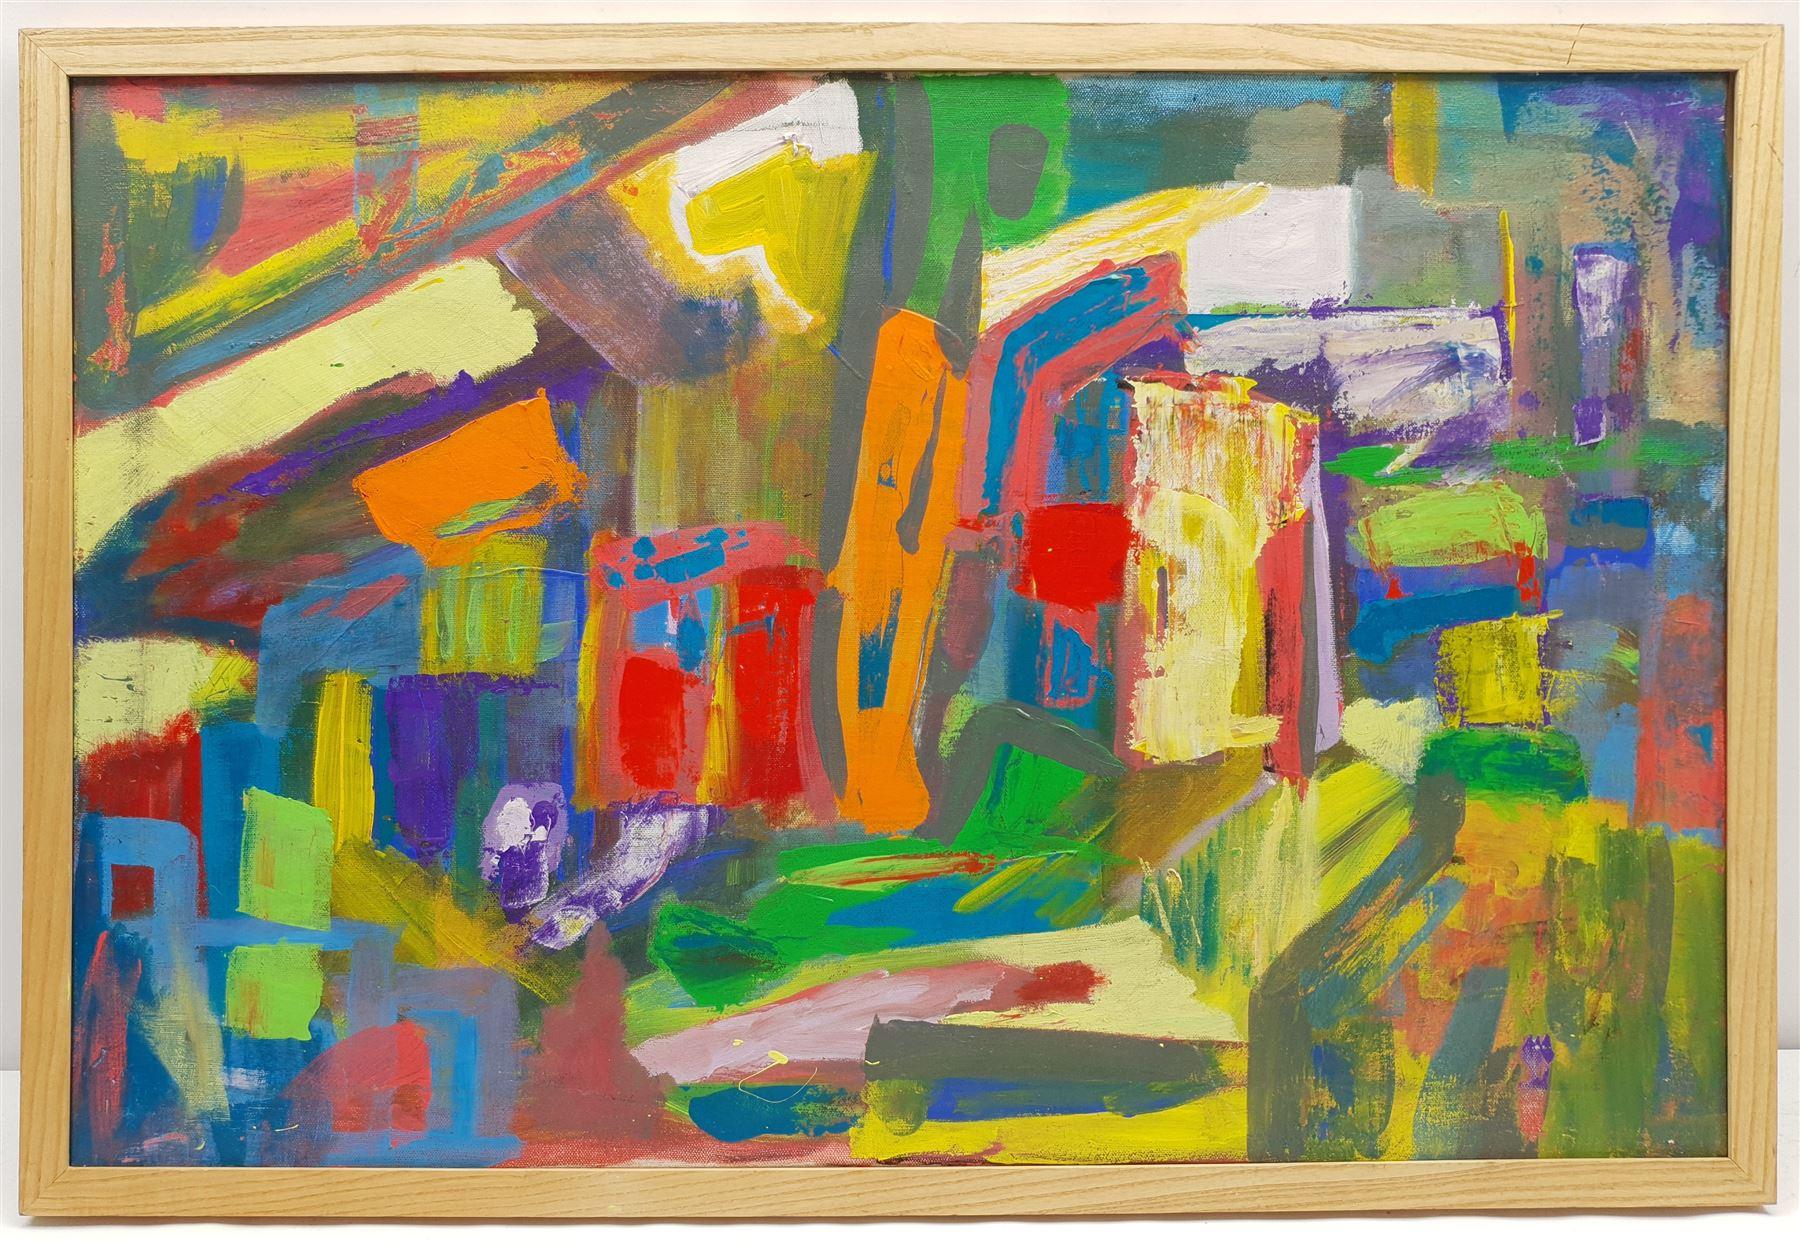 Geoffrey Harrop (British 1947-): 'Souk' - Arabian Abstract - Image 2 of 2